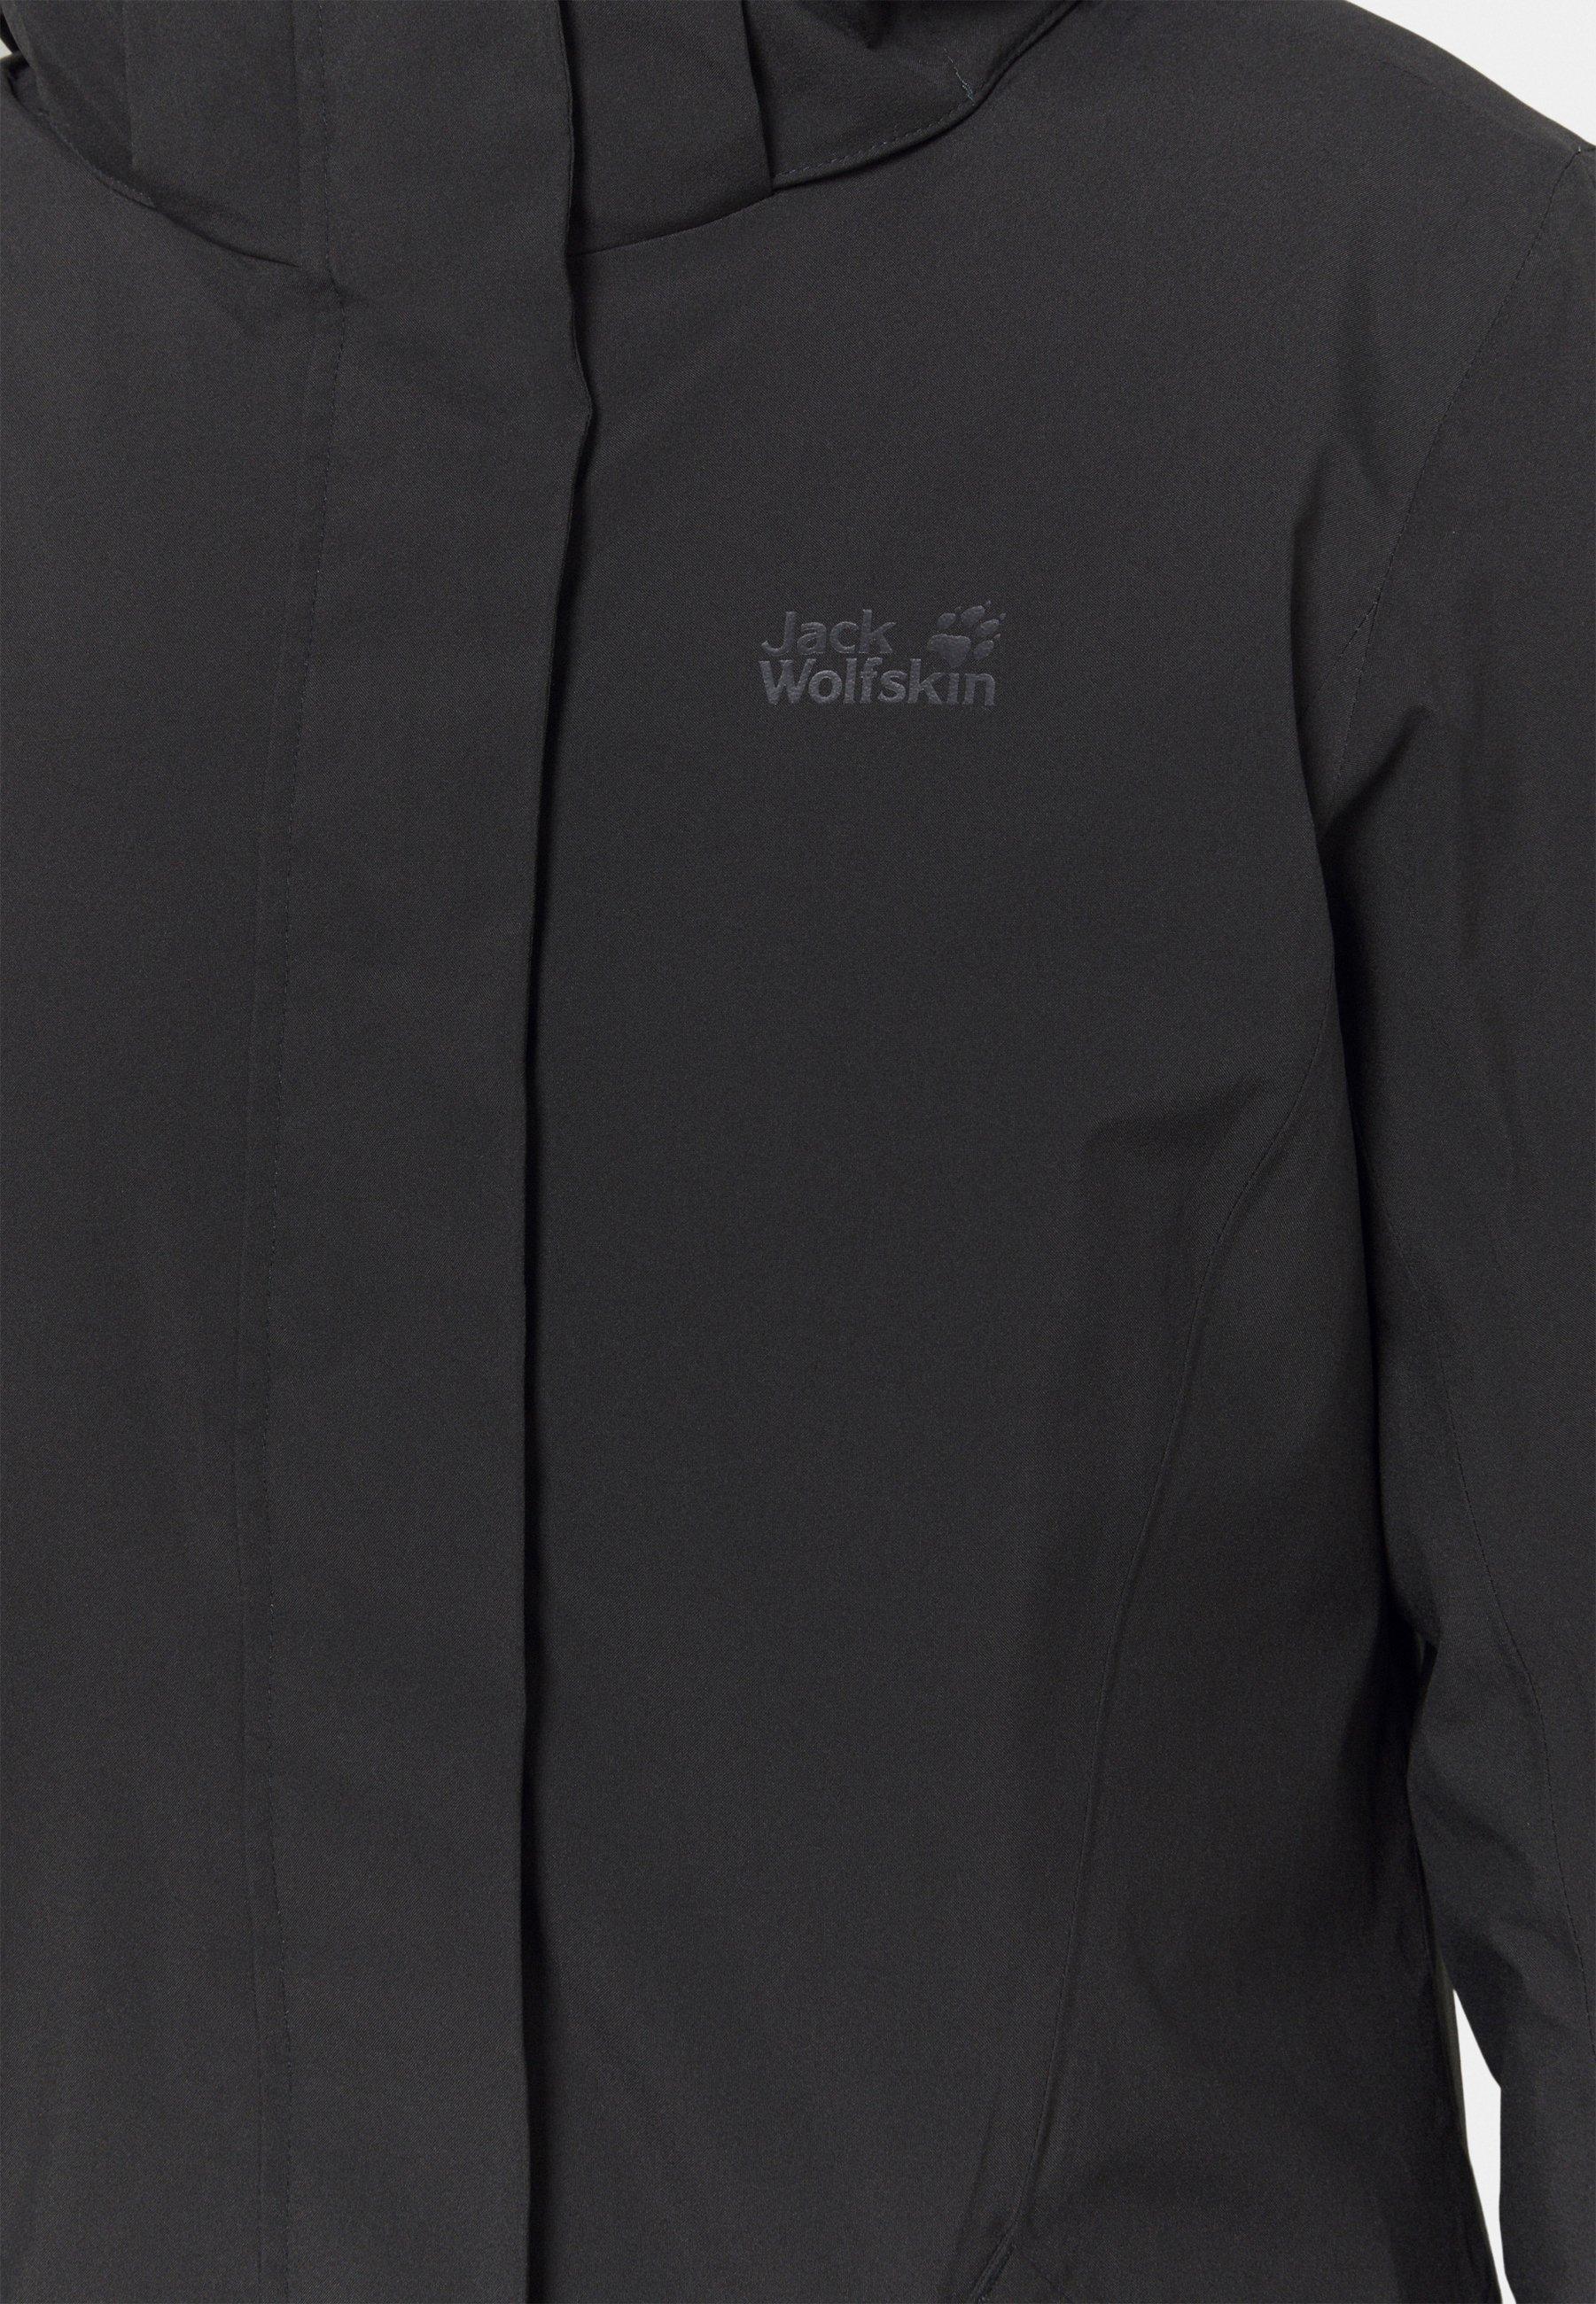 Cool New Styles Women's Clothing Jack Wolfskin COLD BAY COAT Down coat phantom JdZH9EGBo sIWtSaPxM